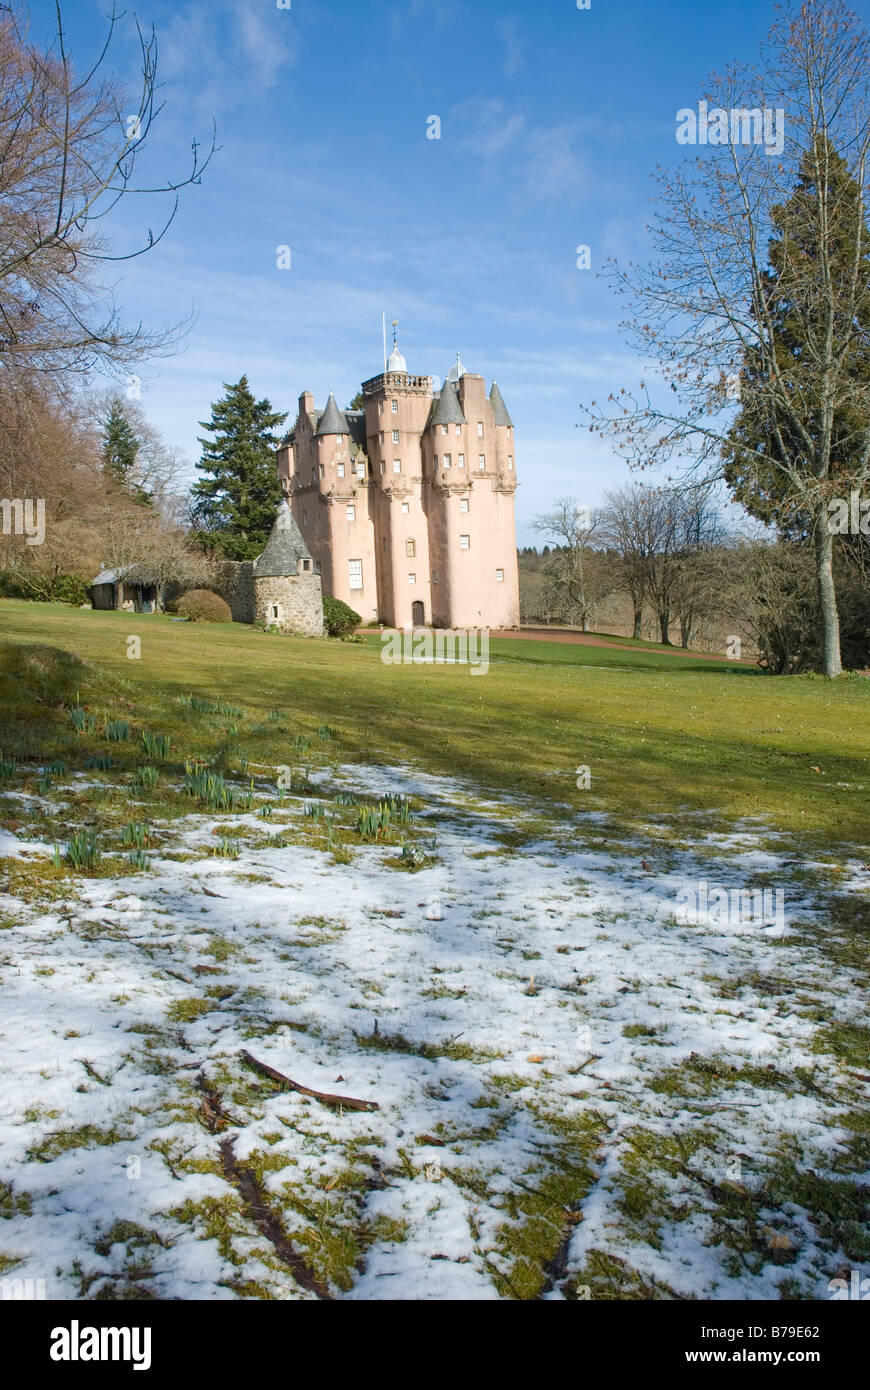 Craigievar Castle nr Alford Aberdeenshire Scotland - Stock Image